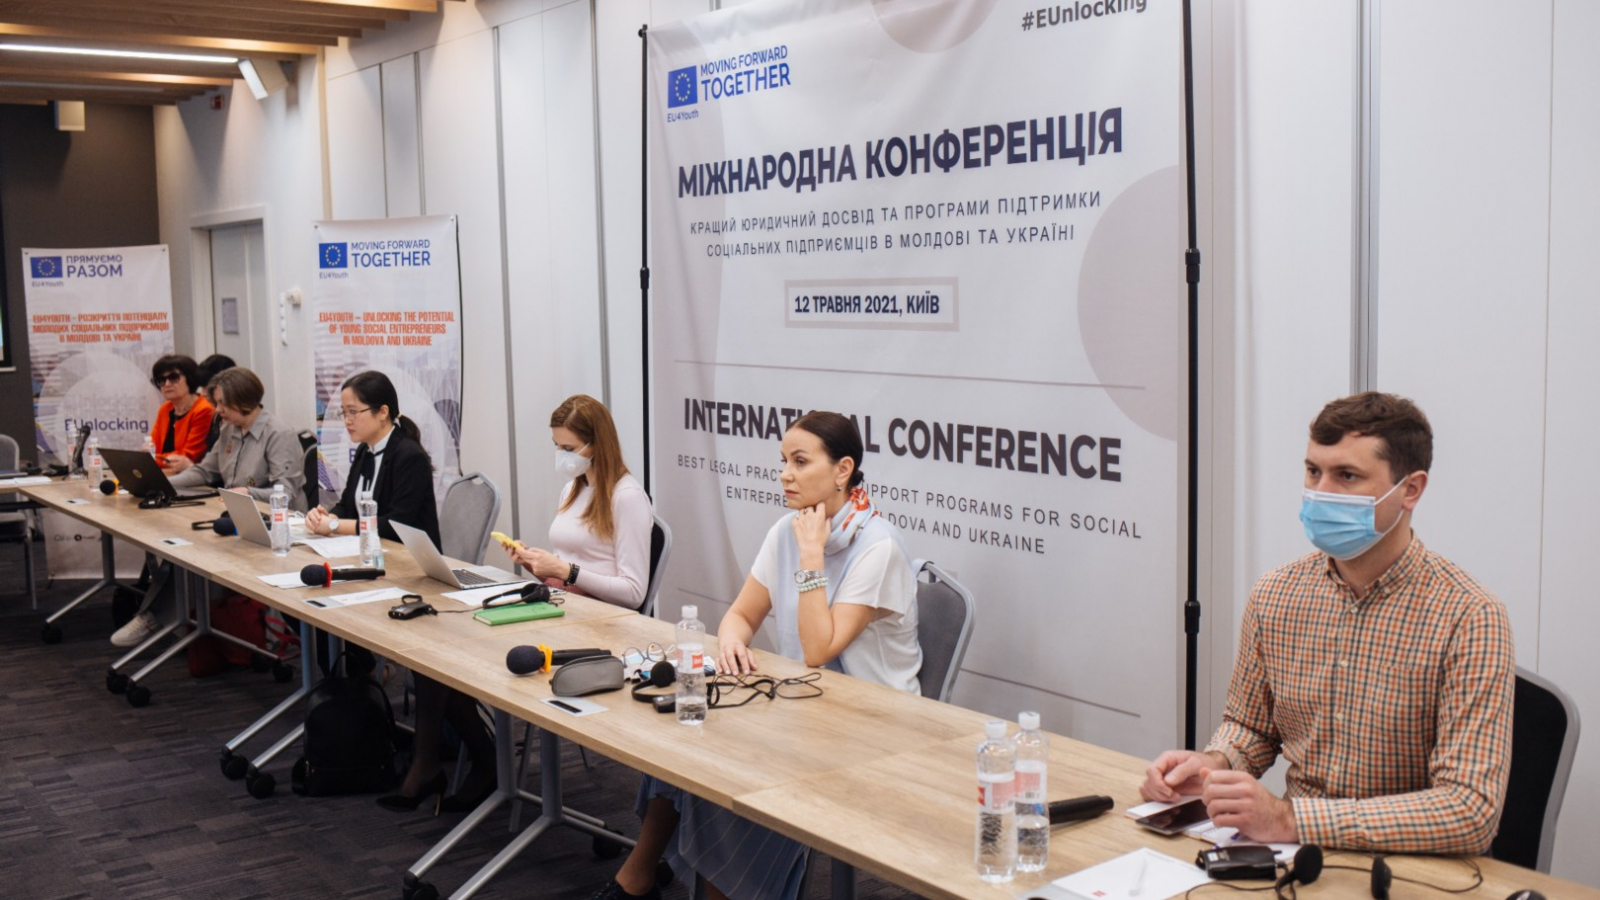 EU4Youth Hosts International Conference on Social Entrepreneurship in Moldova and Ukraine